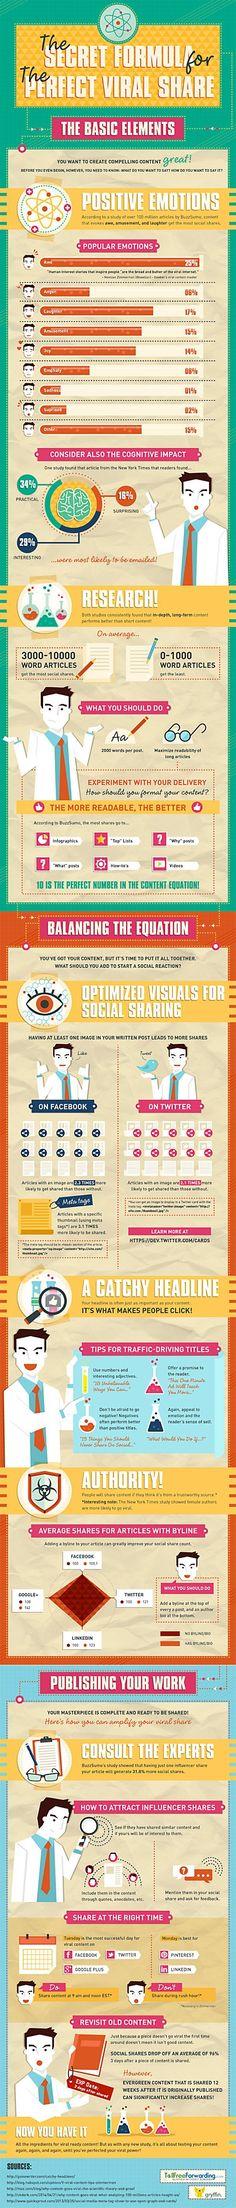 "<a class=""pintag searchlink"" data-query=""#socialmedia"" data-type=""hashtag"" href=""/search/?q=#socialmedia&rs=hashtag"" rel=""nofollow"" title=""#socialmedia search Pinterest"">#socialmedia</a> tips"